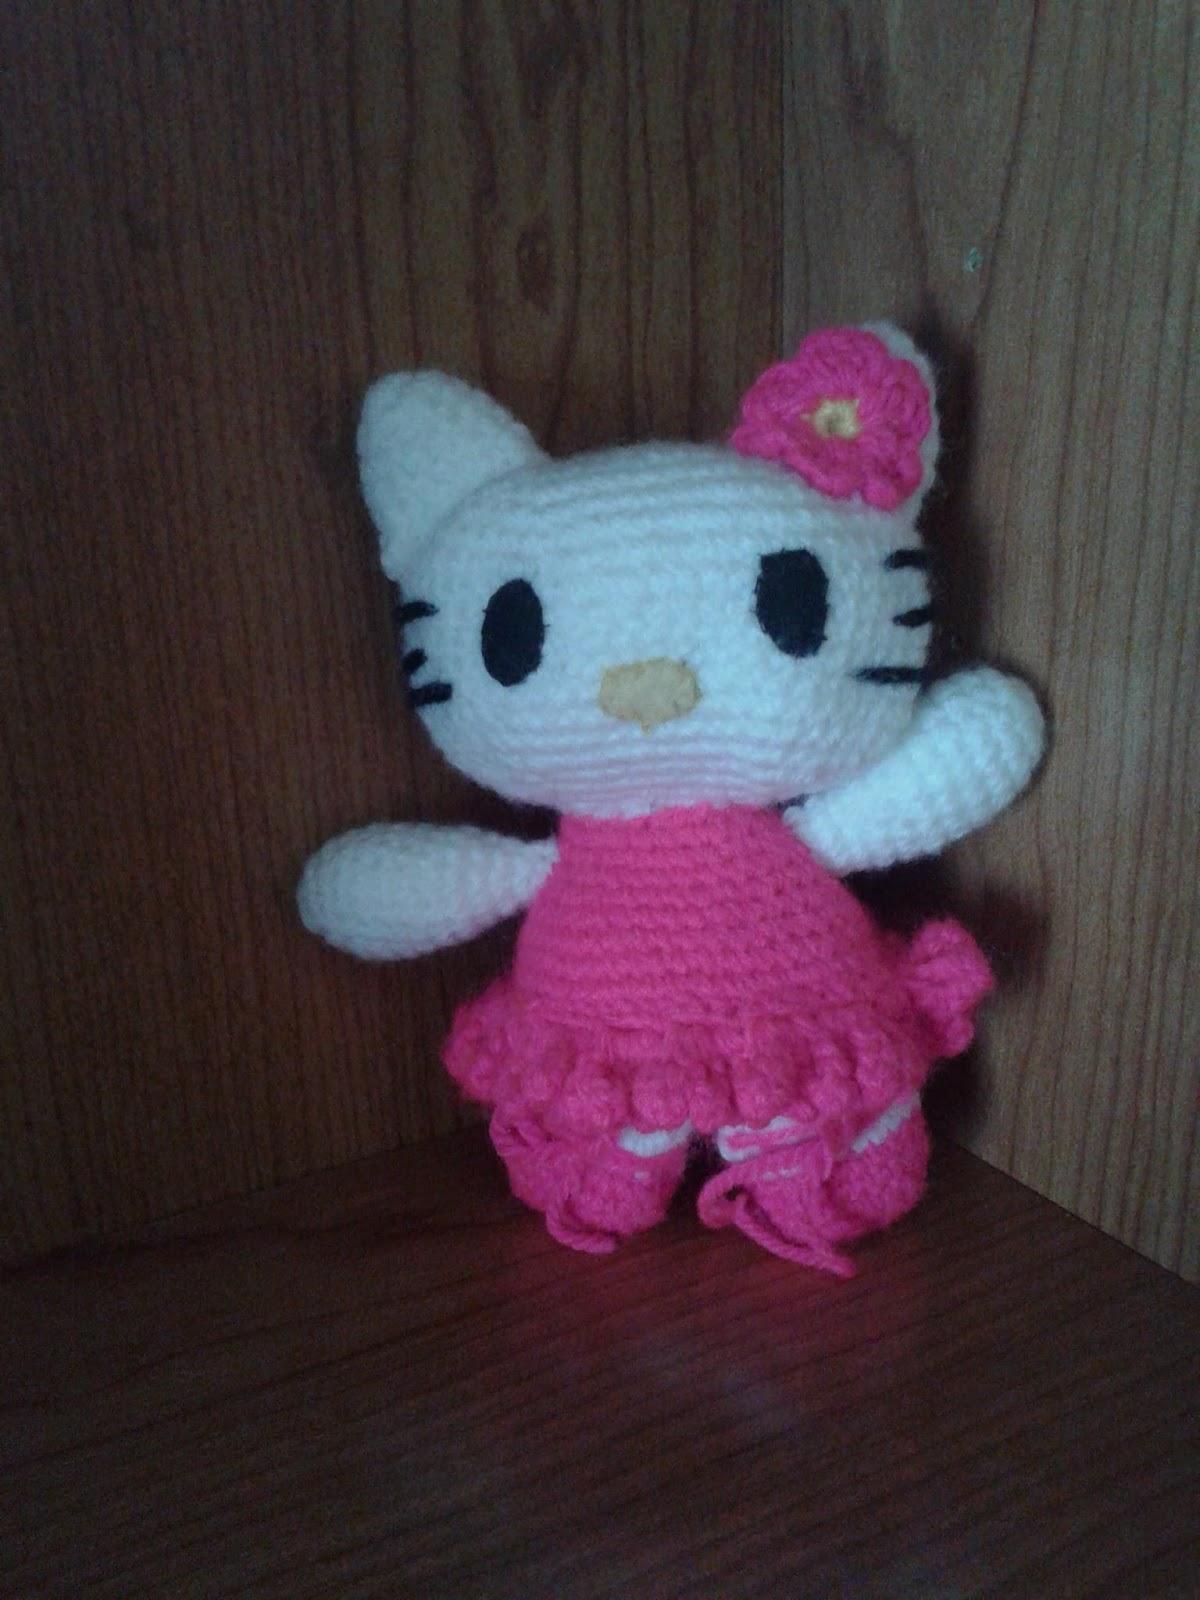 Hello Kitty - Grande (amigurumi) no Elo7 | Ateliê Pink & Purple ... | 1600x1200